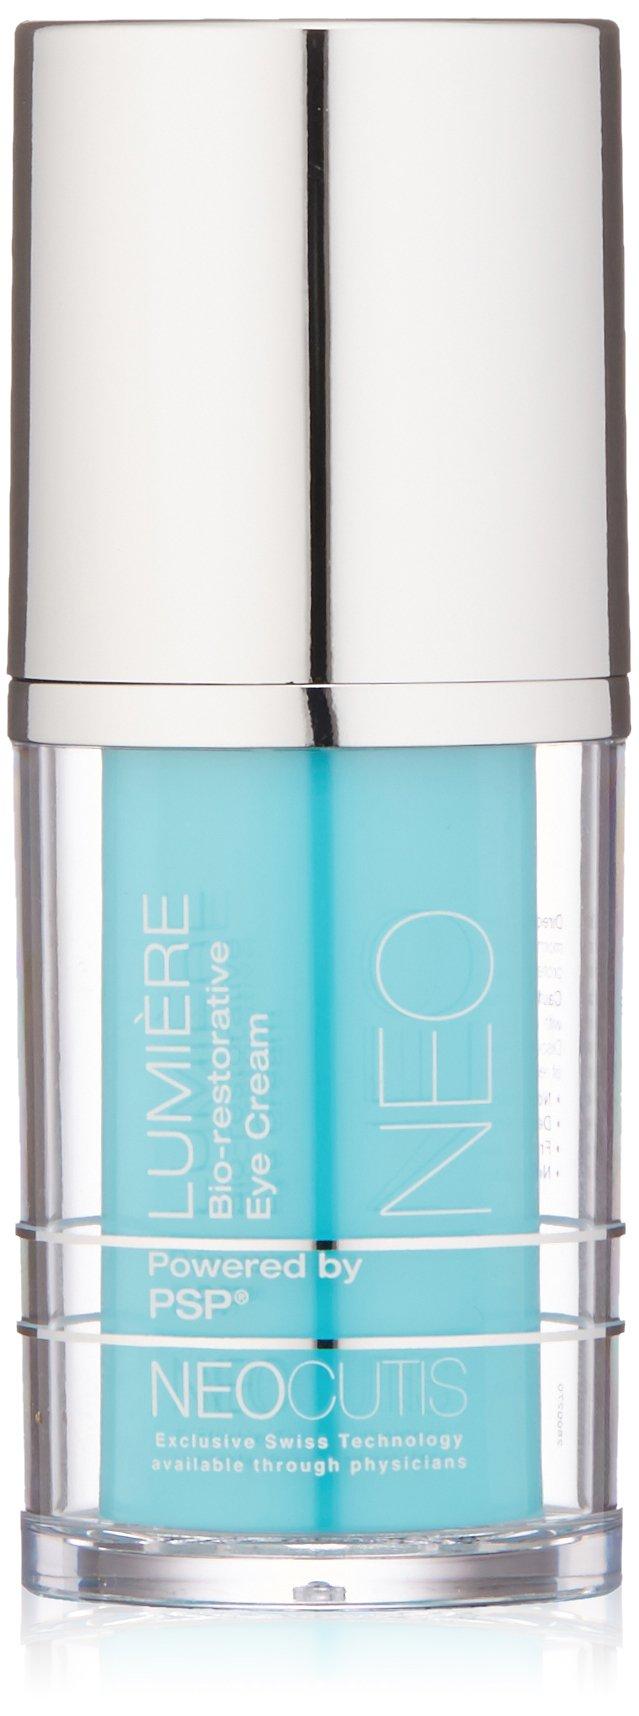 NEOCUTIS Lumière Bio-restorative Eye Cream, 0.5 Fl Oz by NEOCUTIS